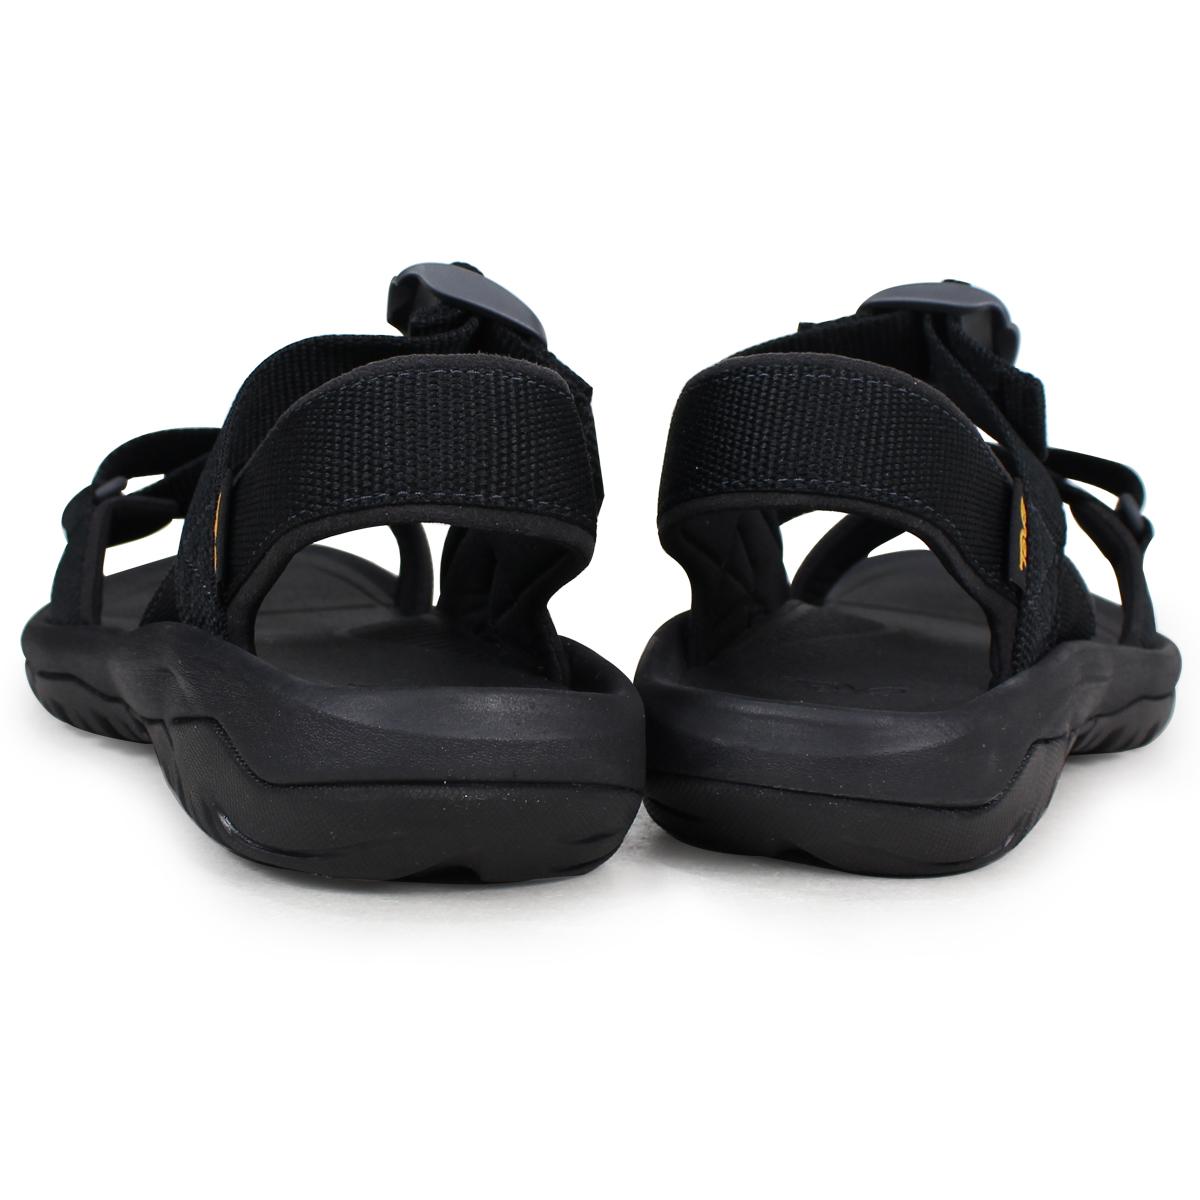 475497cf6788 Teva HURRICANE CROSS STRAP Teva sandals men hurricane XLT2 black dark olive  1091589  4 18 Shinnyu load